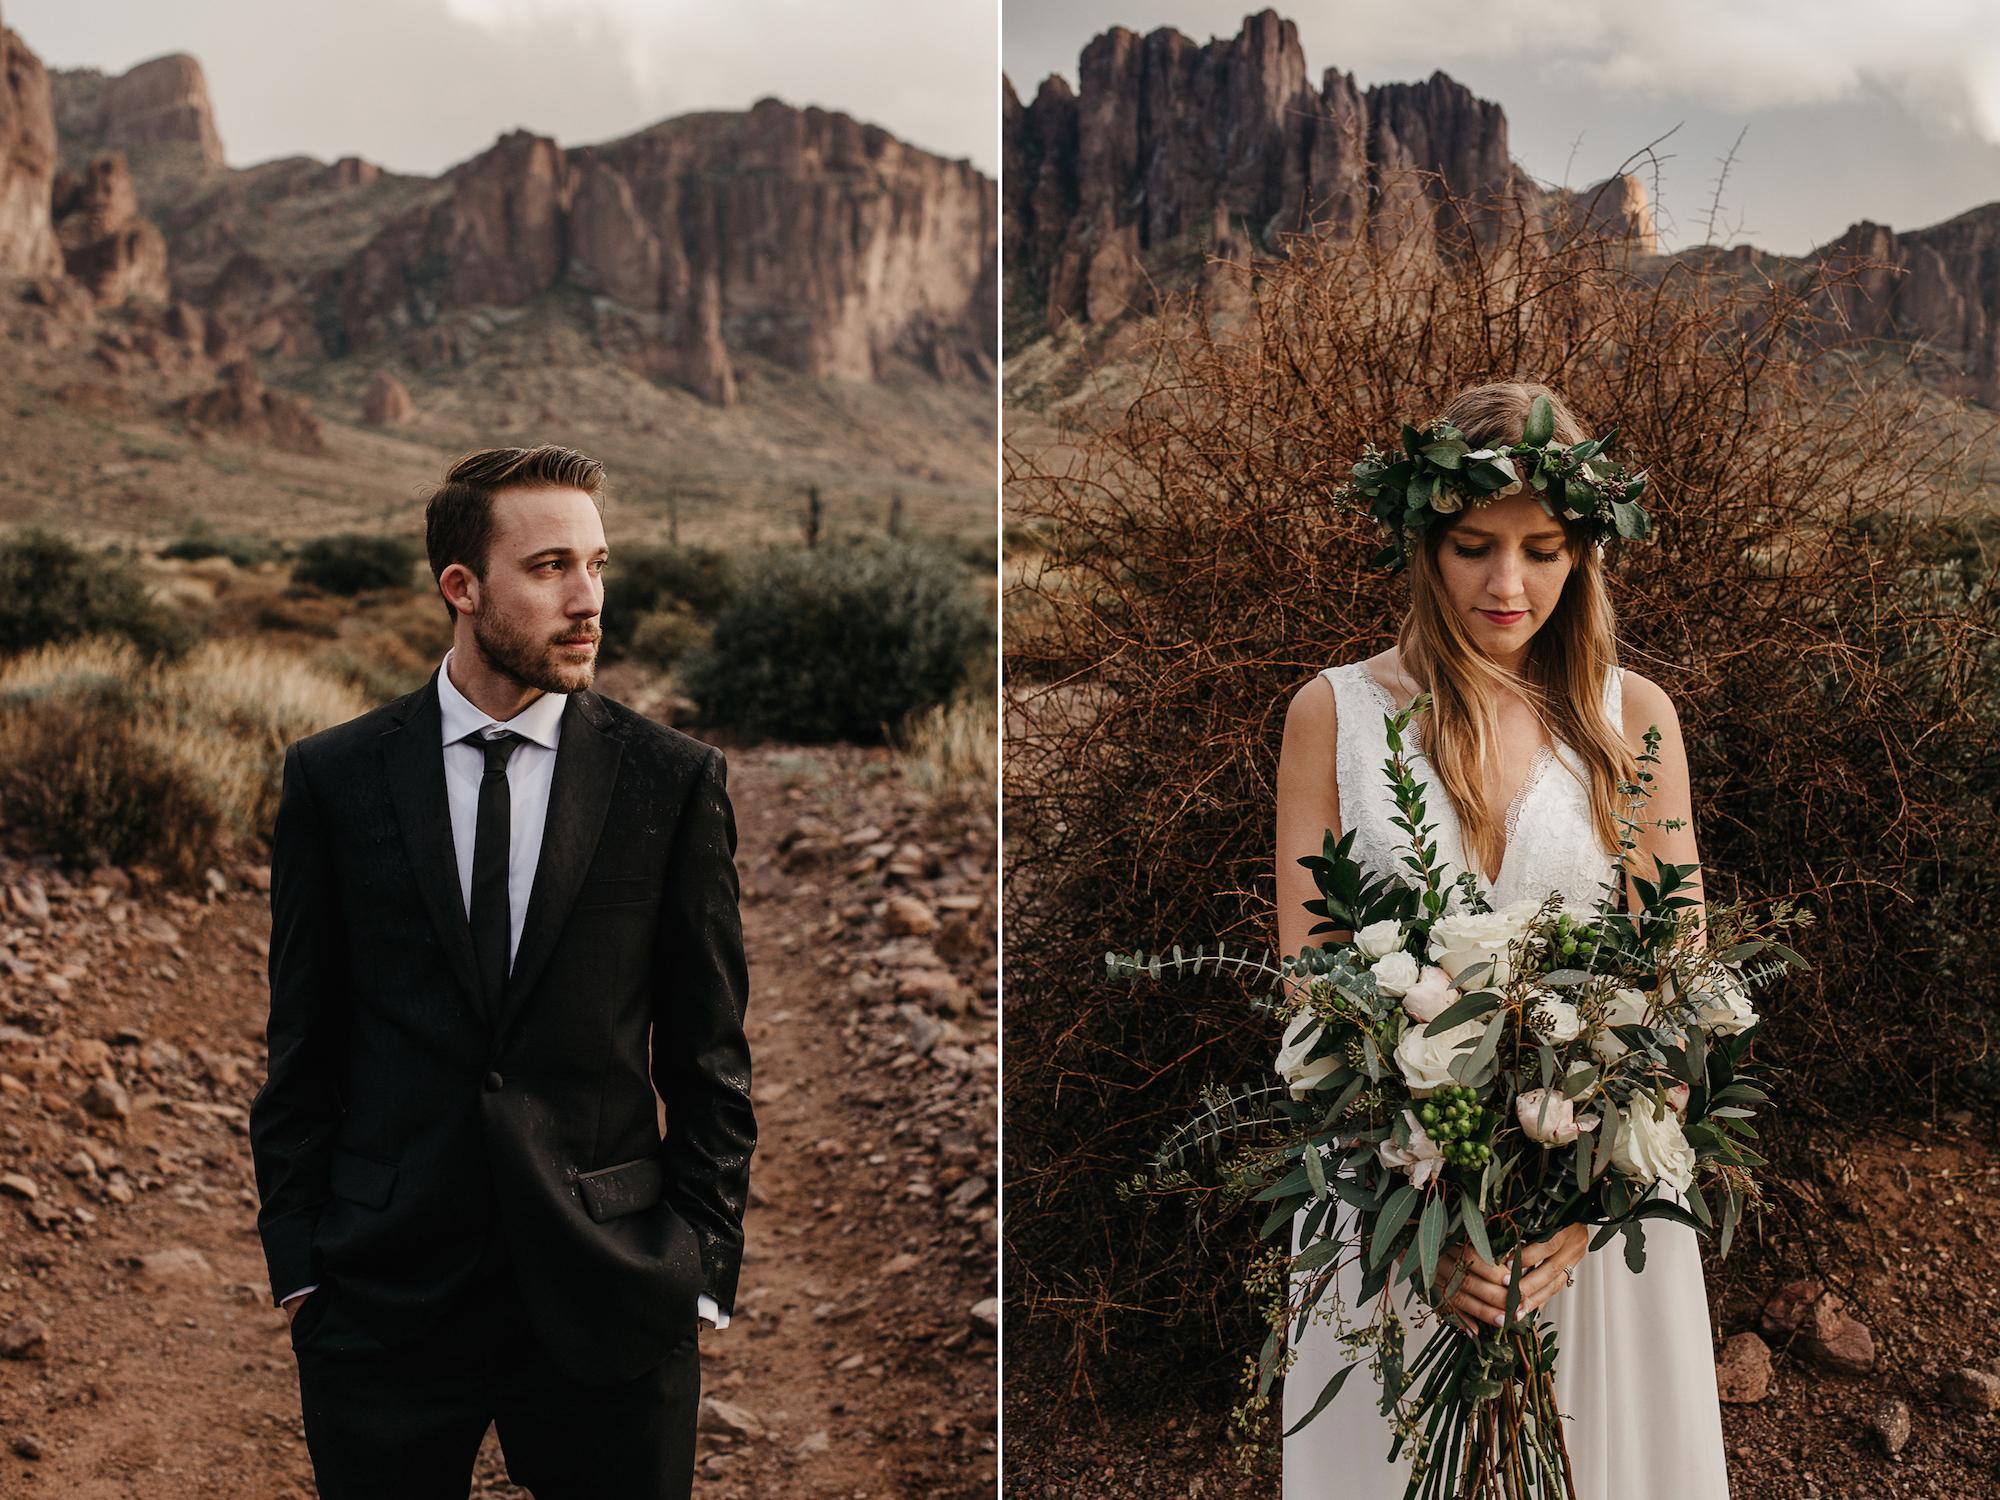 arizona - wedding - photographer843.jpg